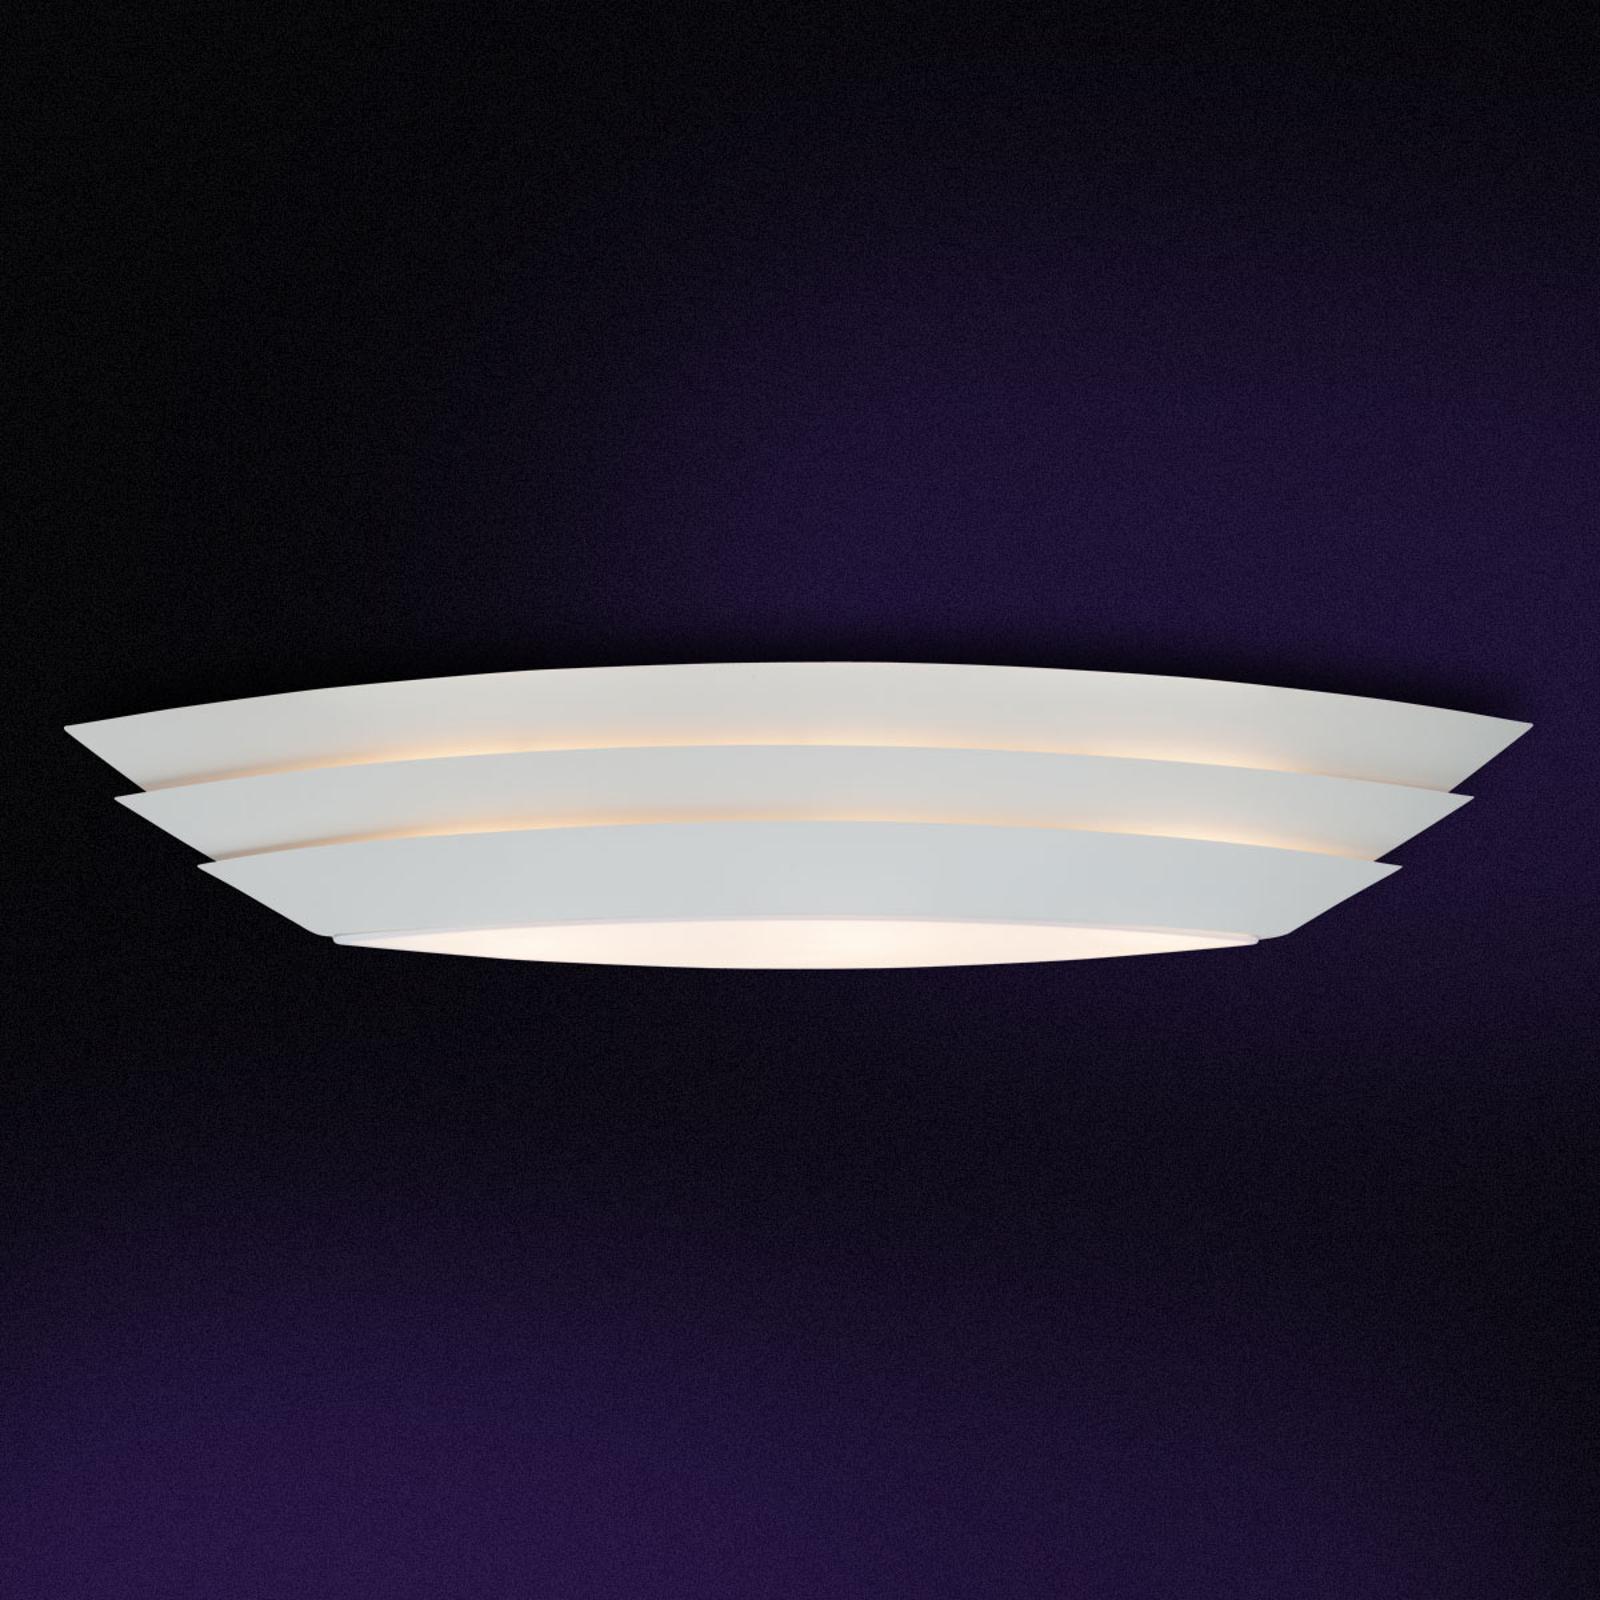 Lámpara de techo Ship con formas interesantes